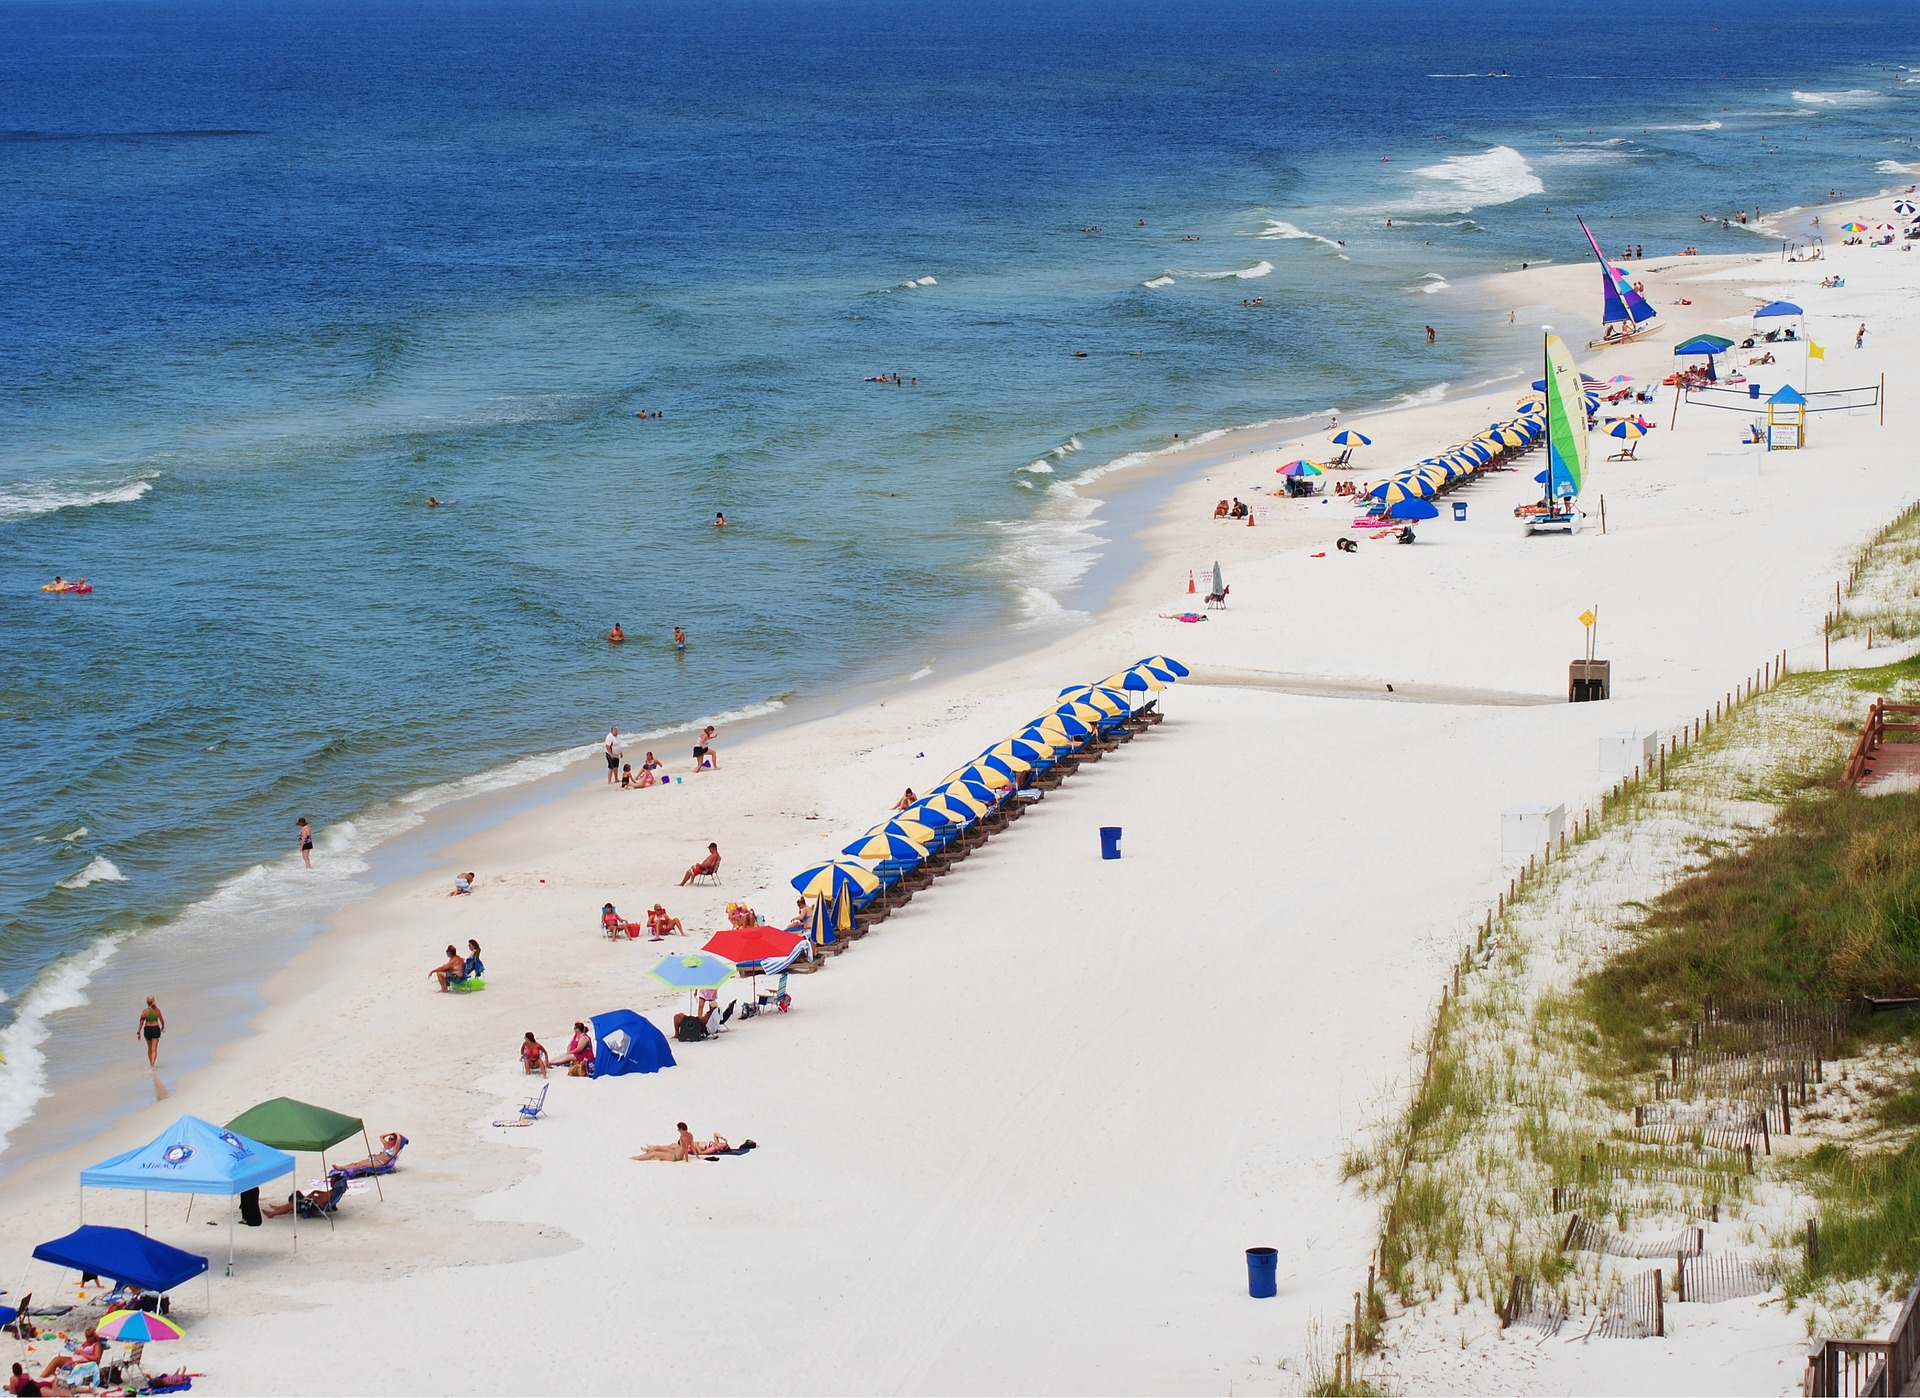 Strandabschnitt Urlaub in Panama City günstig buchen